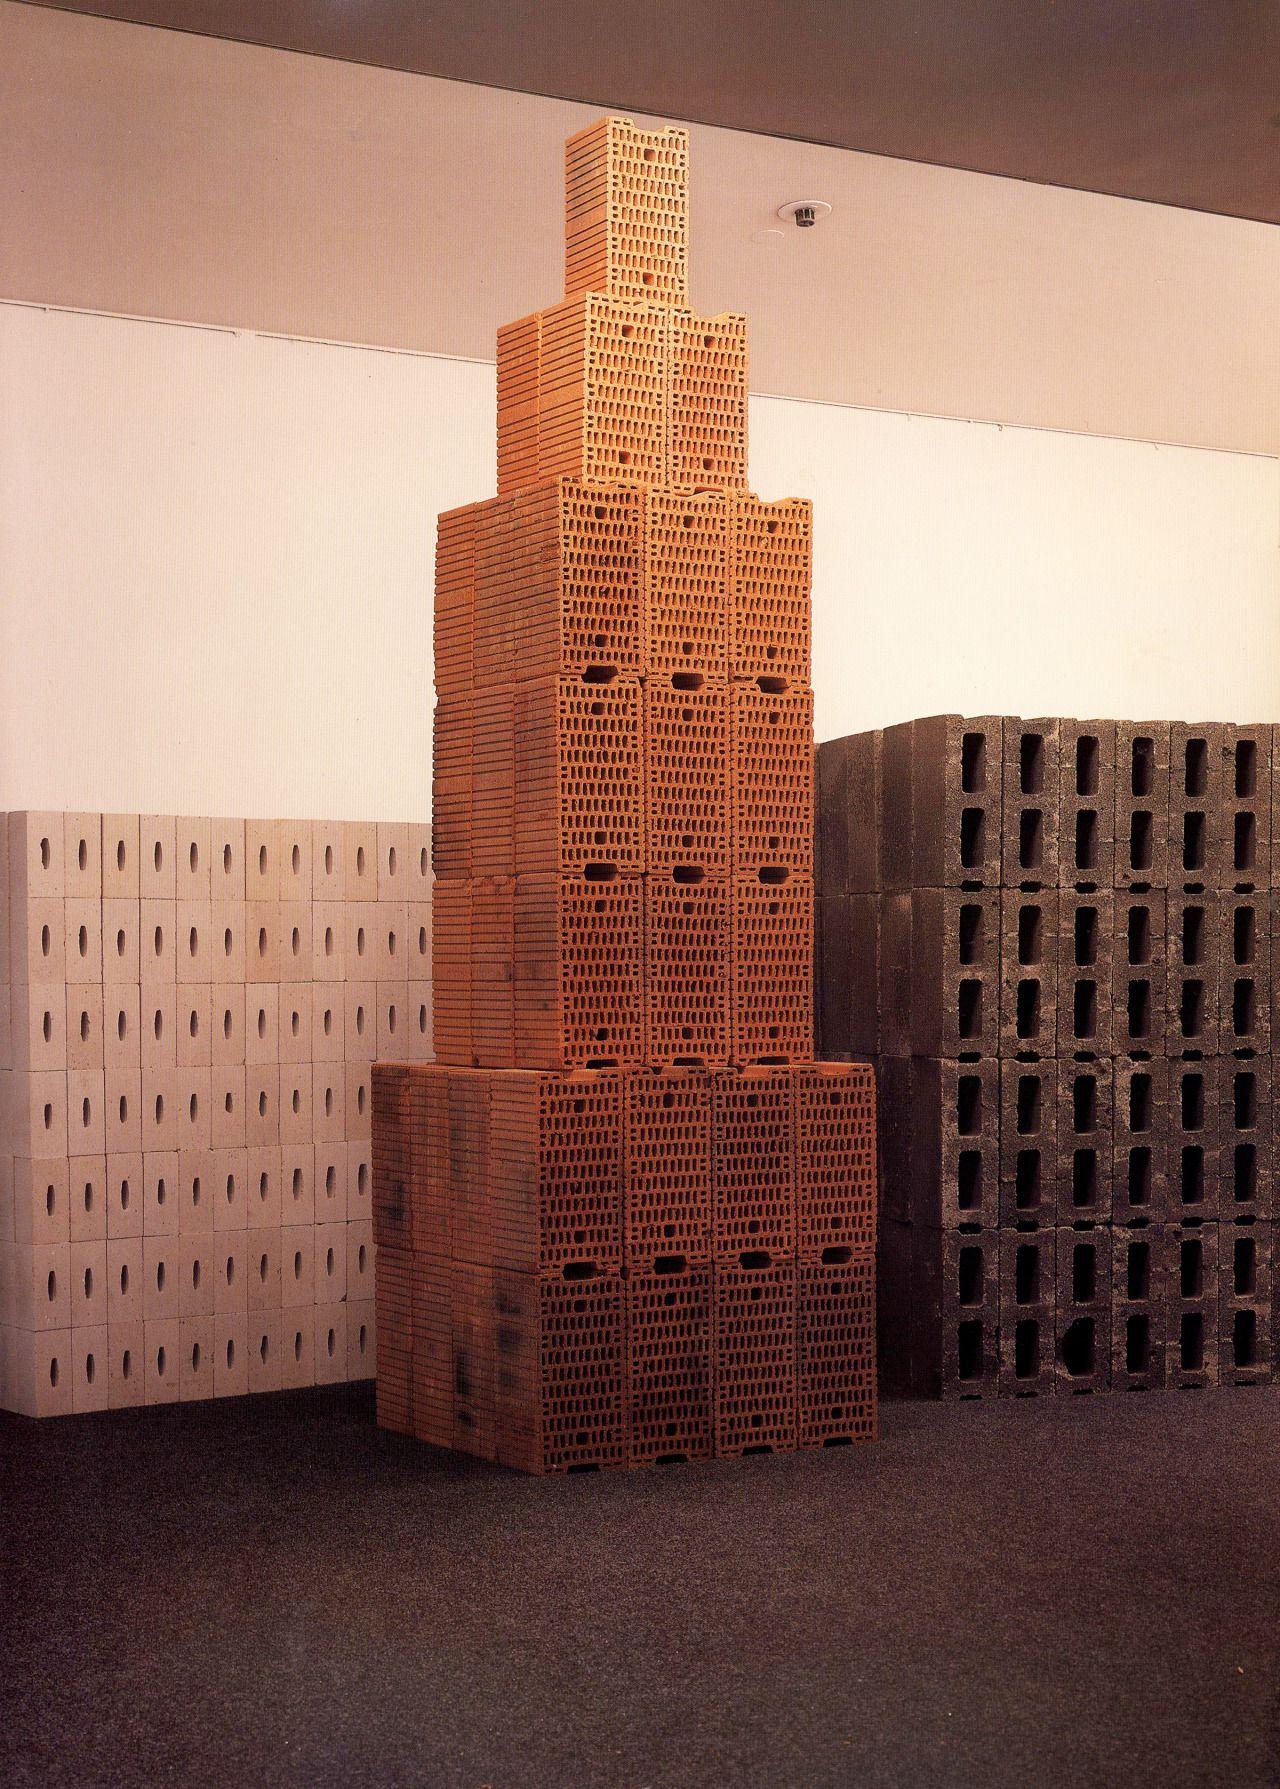 // Tony Cragg, 'Three Modern Buildings', 1984.